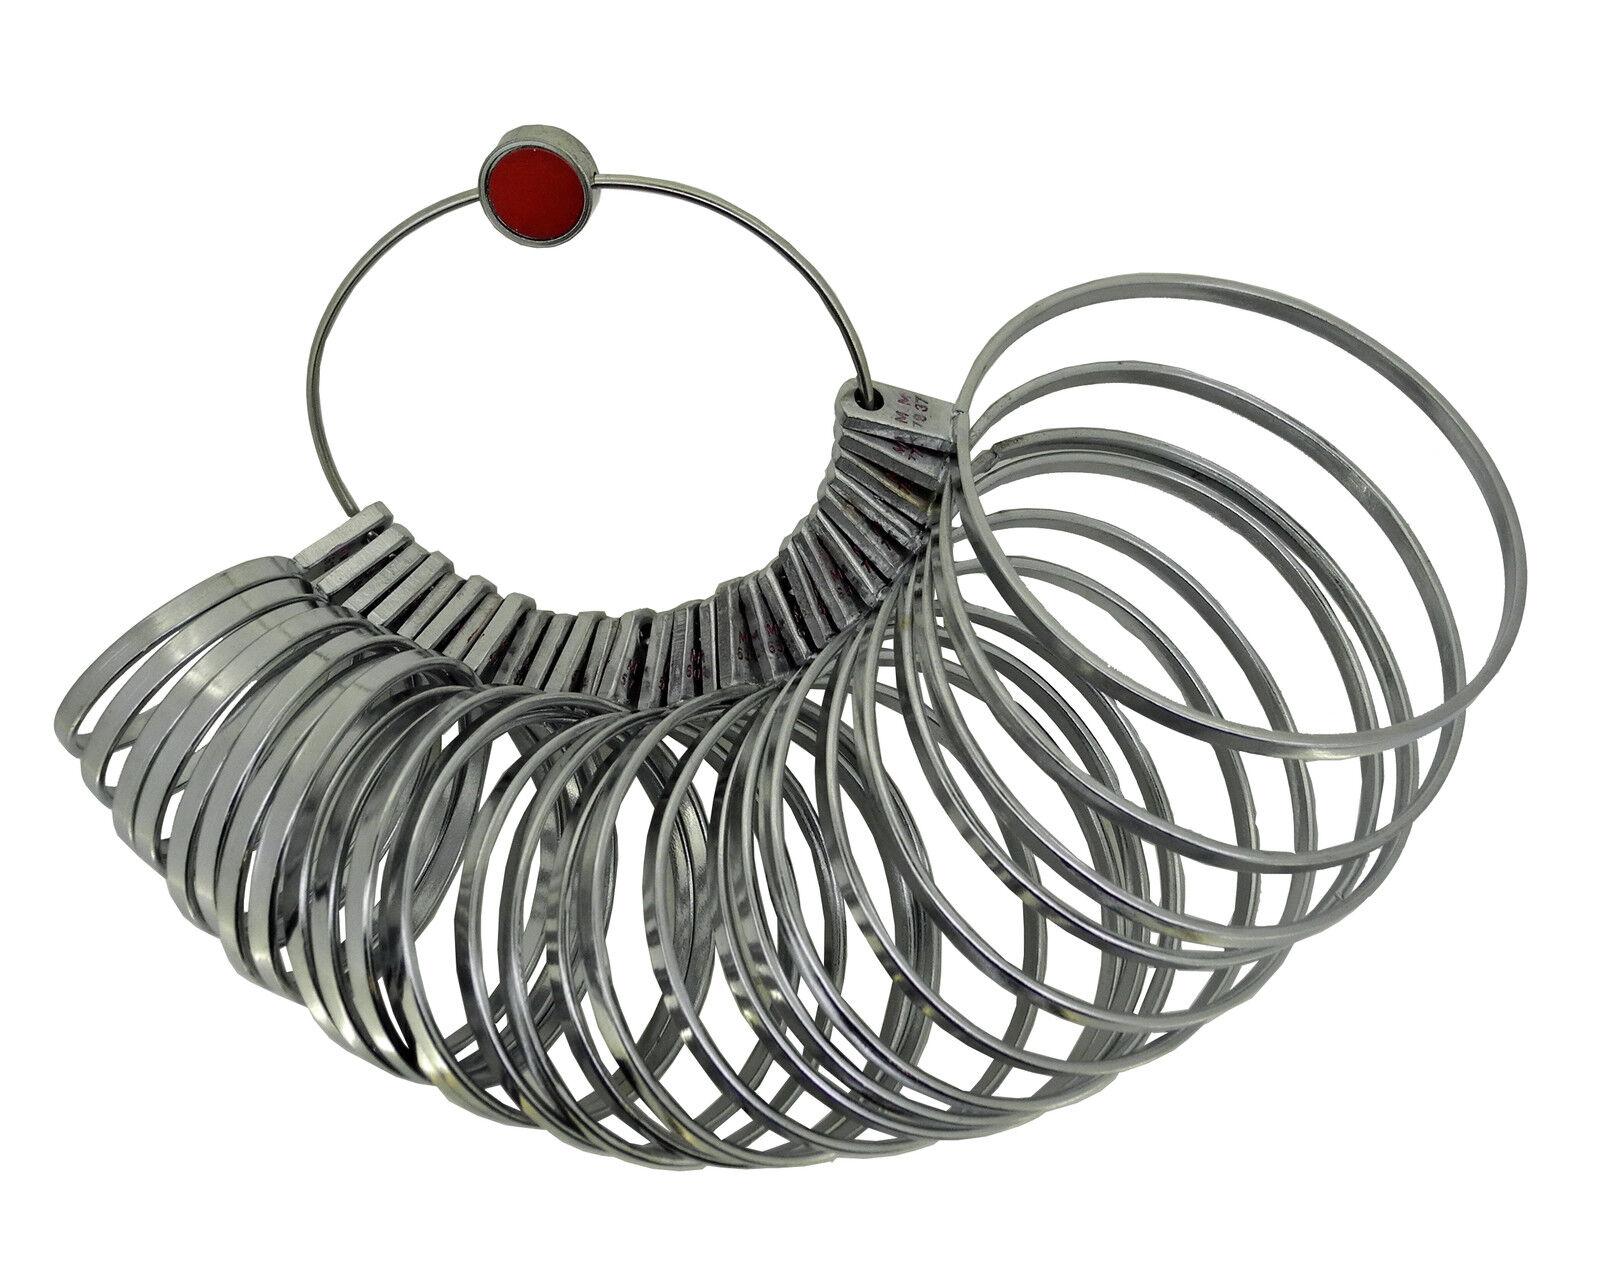 Bangle Bracelet Hand Wrist Metal Sizer Gauge Measure